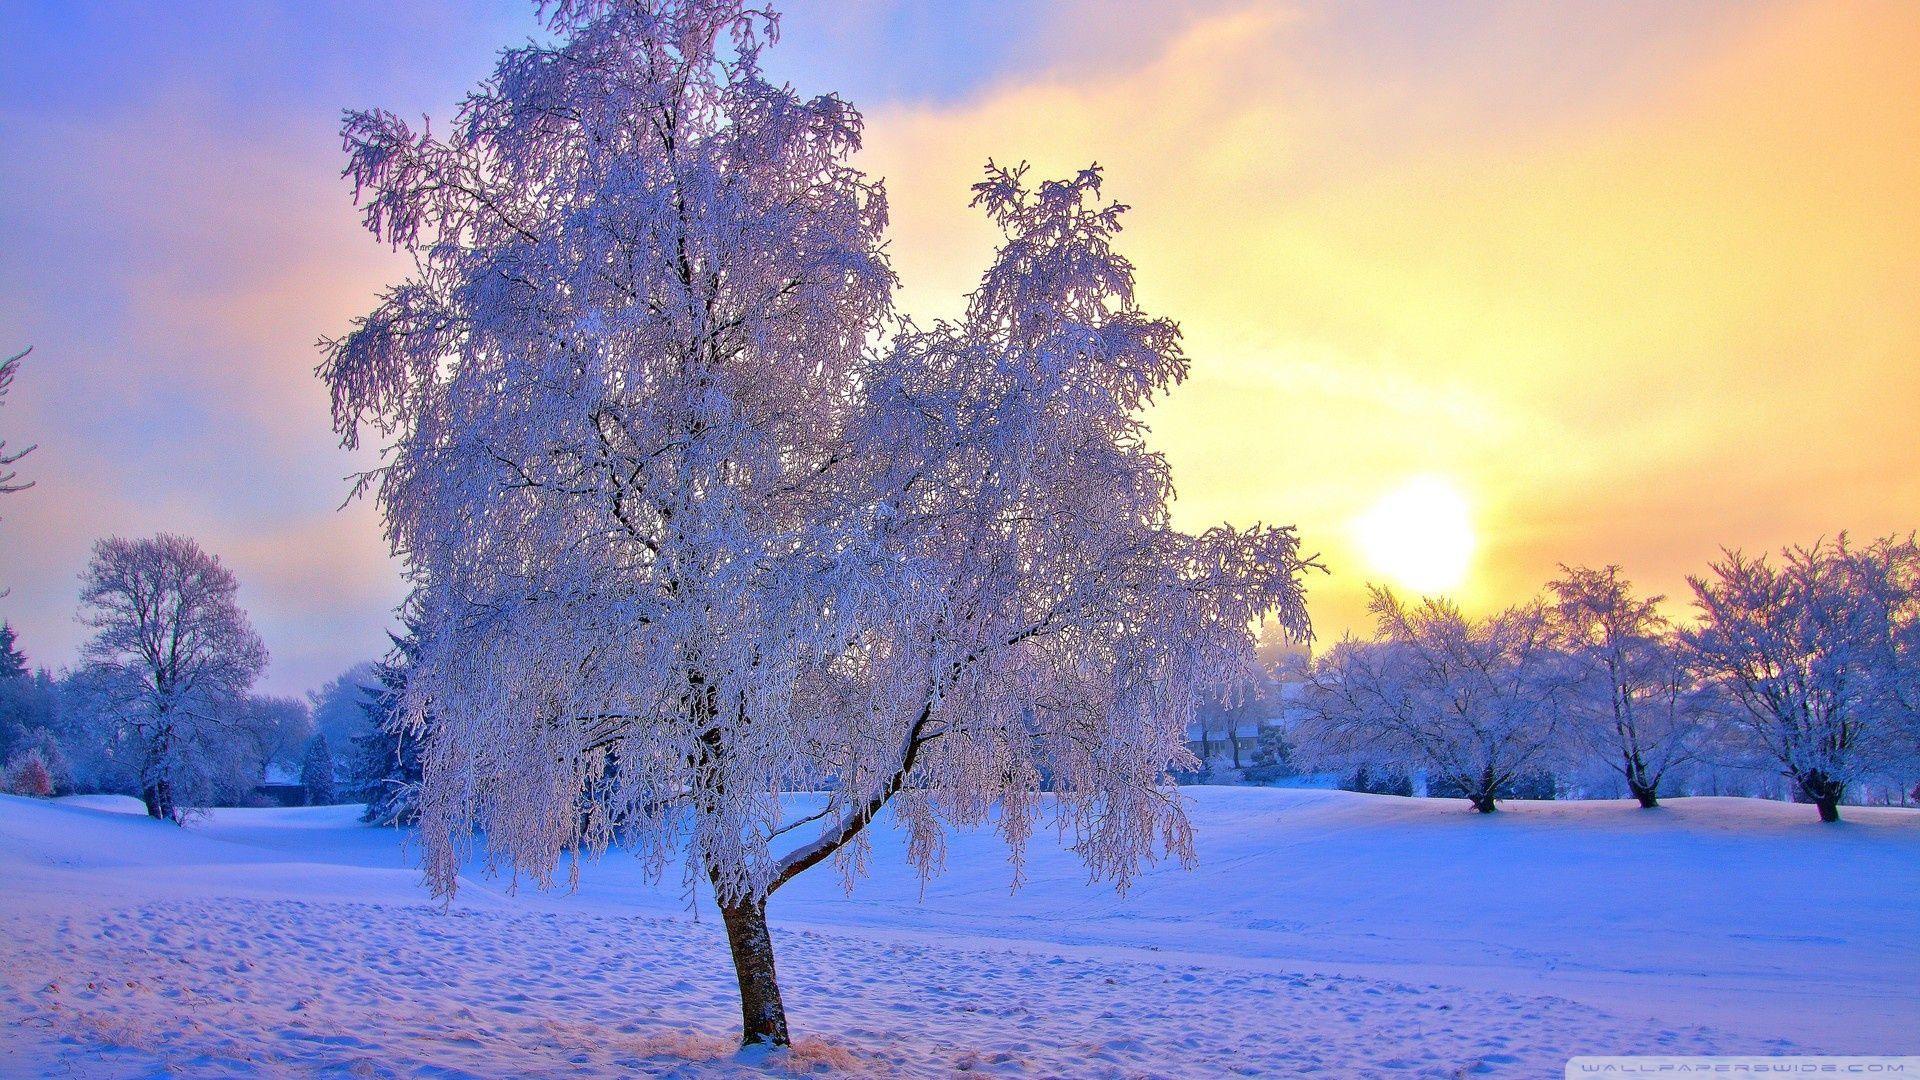 Winter Sunset Desktop Wallpapers Top Free Winter Sunset Desktop Backgrounds Wallpaperaccess